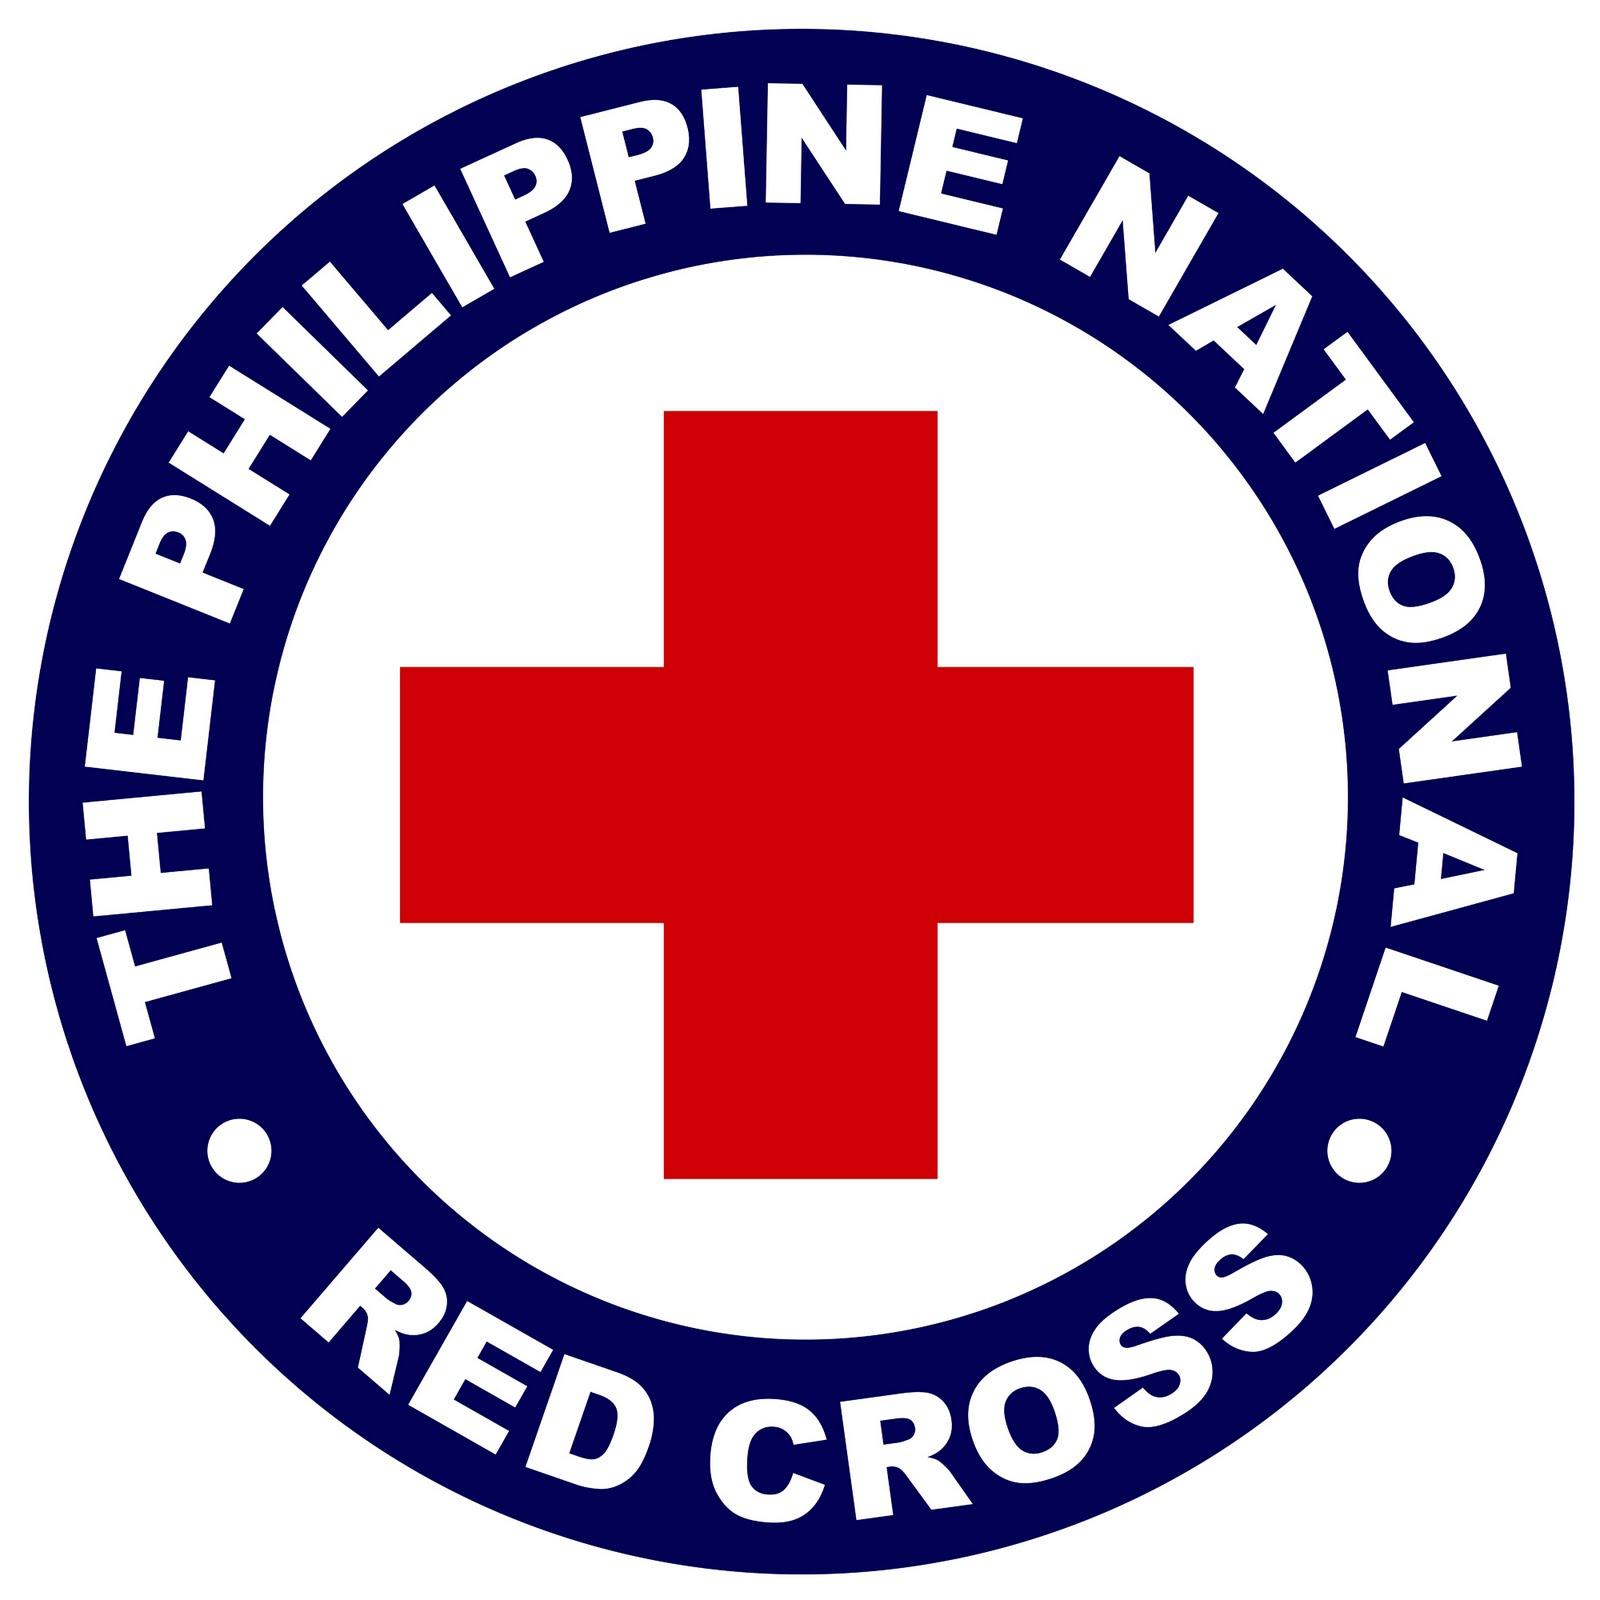 File:Philippine National Red Cross logo (obsolete).jpg.